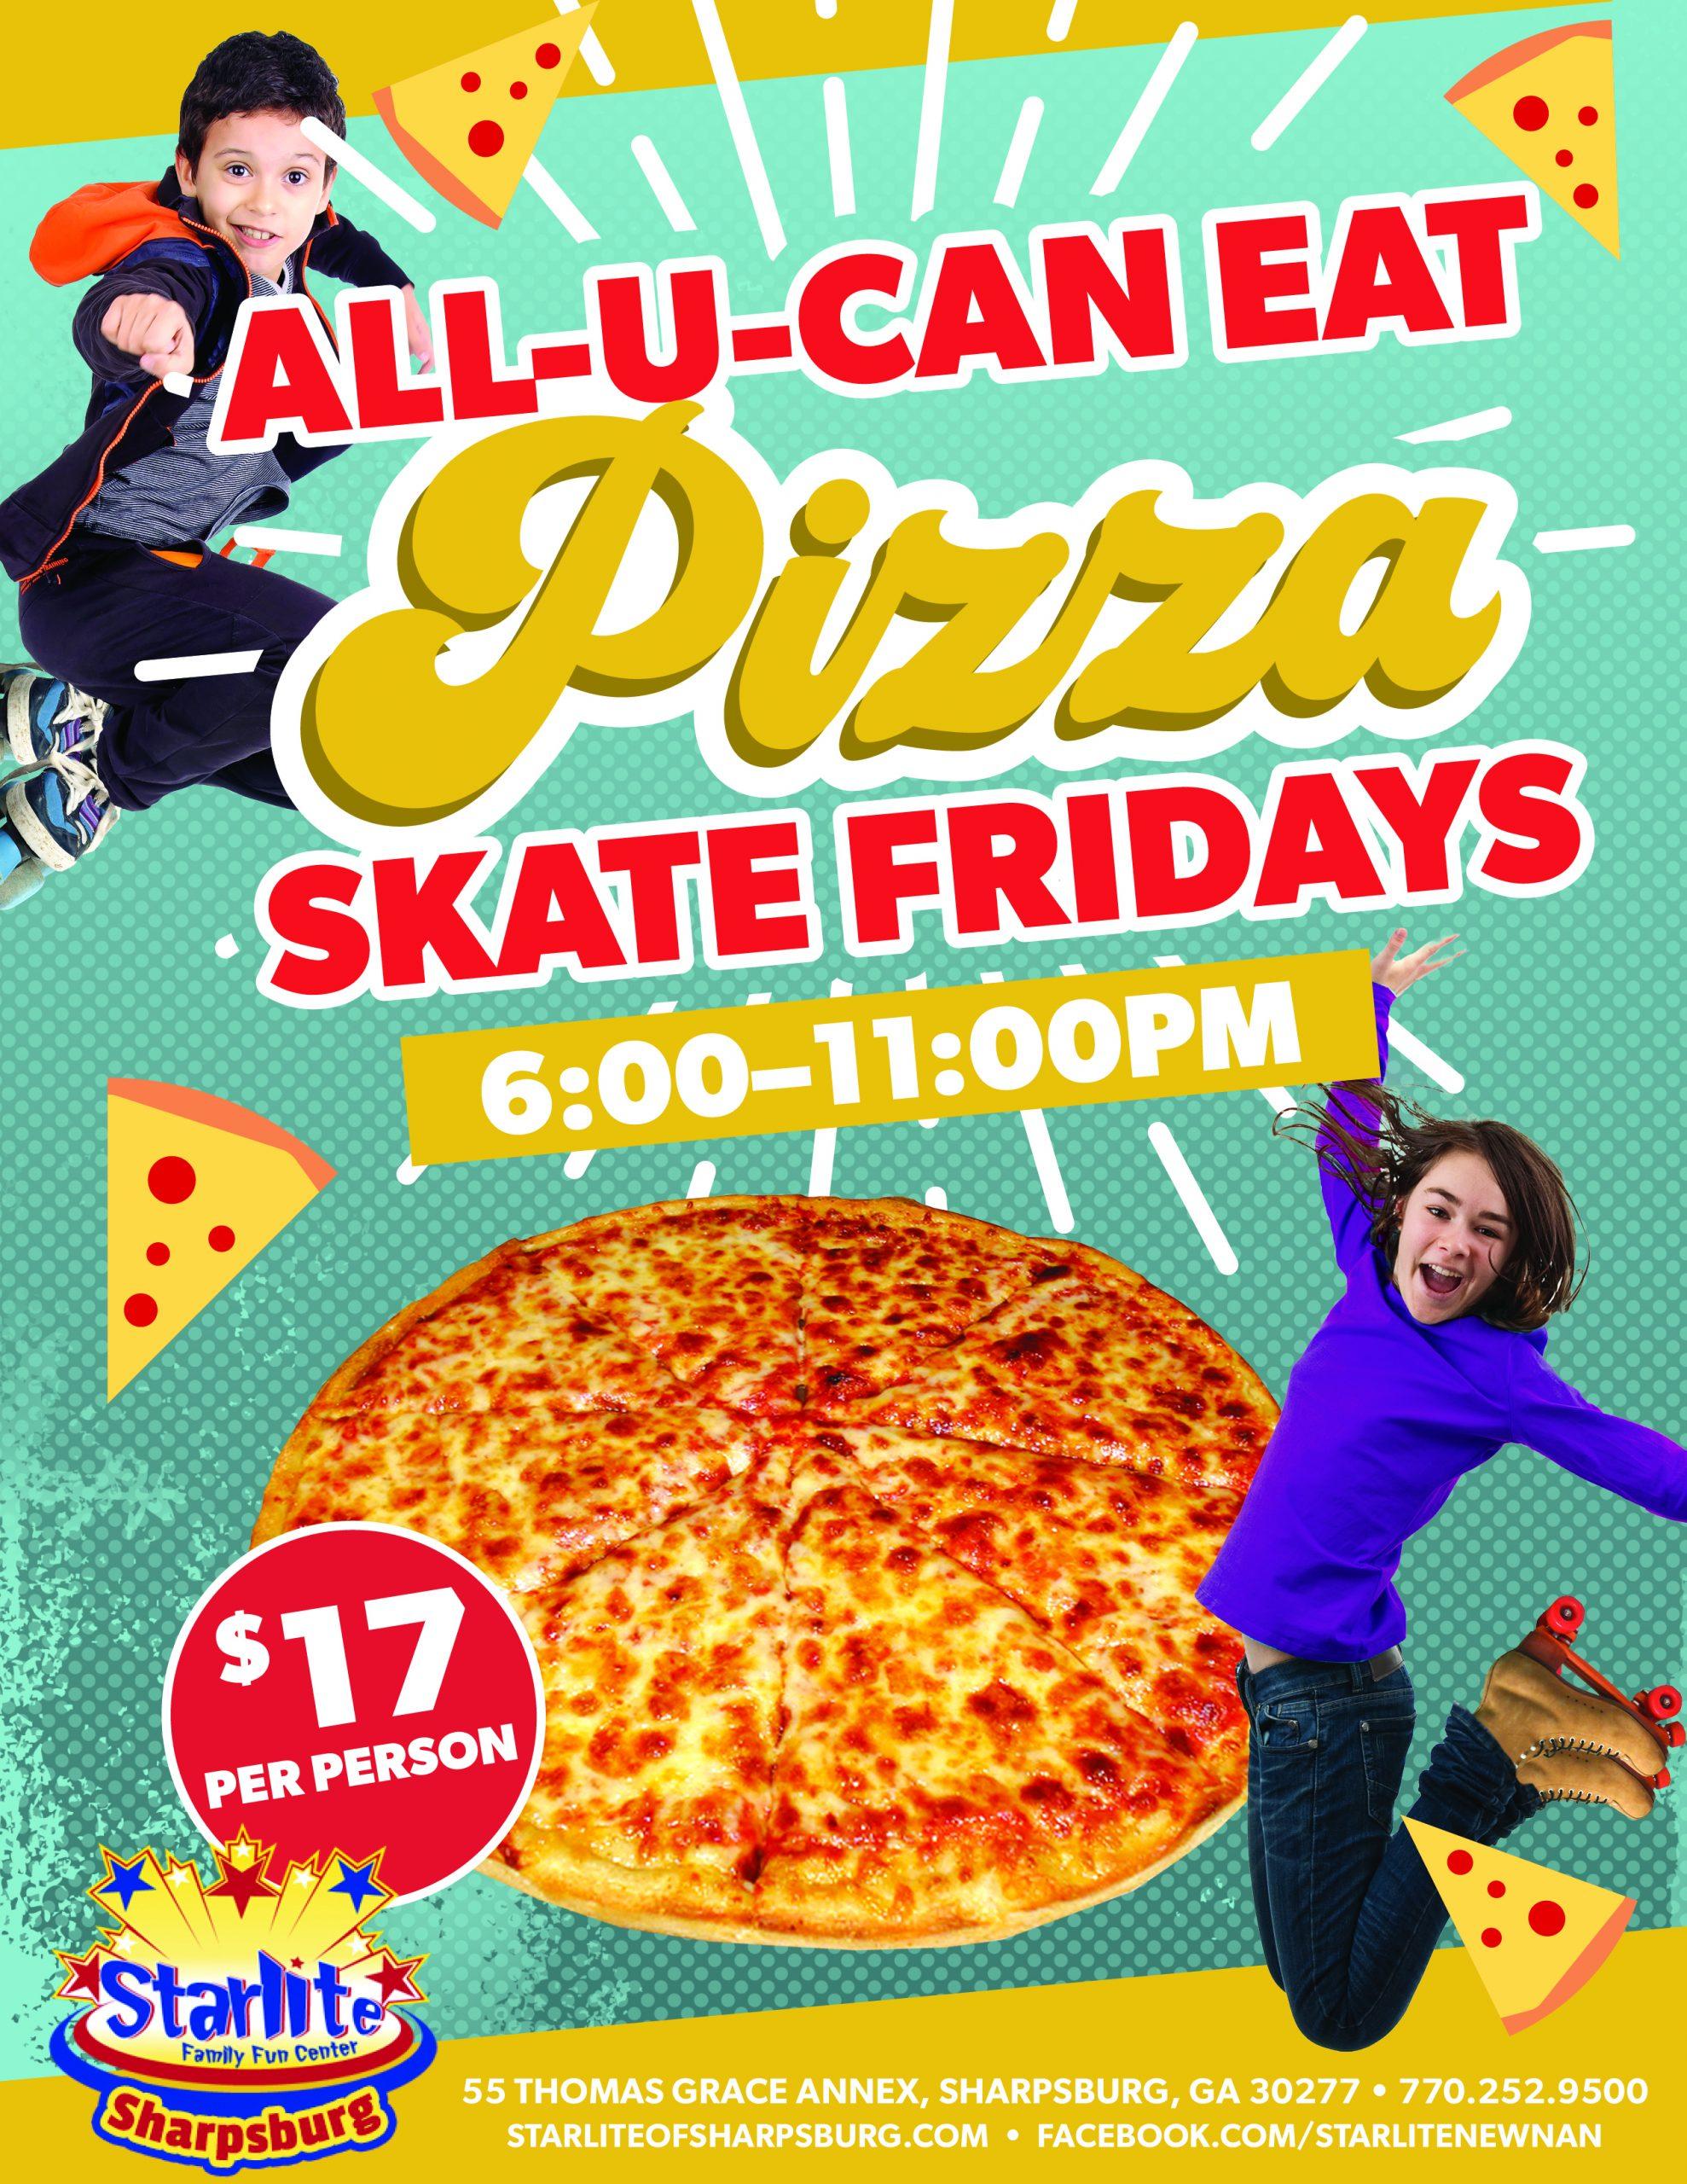 GA21-009 All You Can Eat Pizza Flyer-Sharpsburg